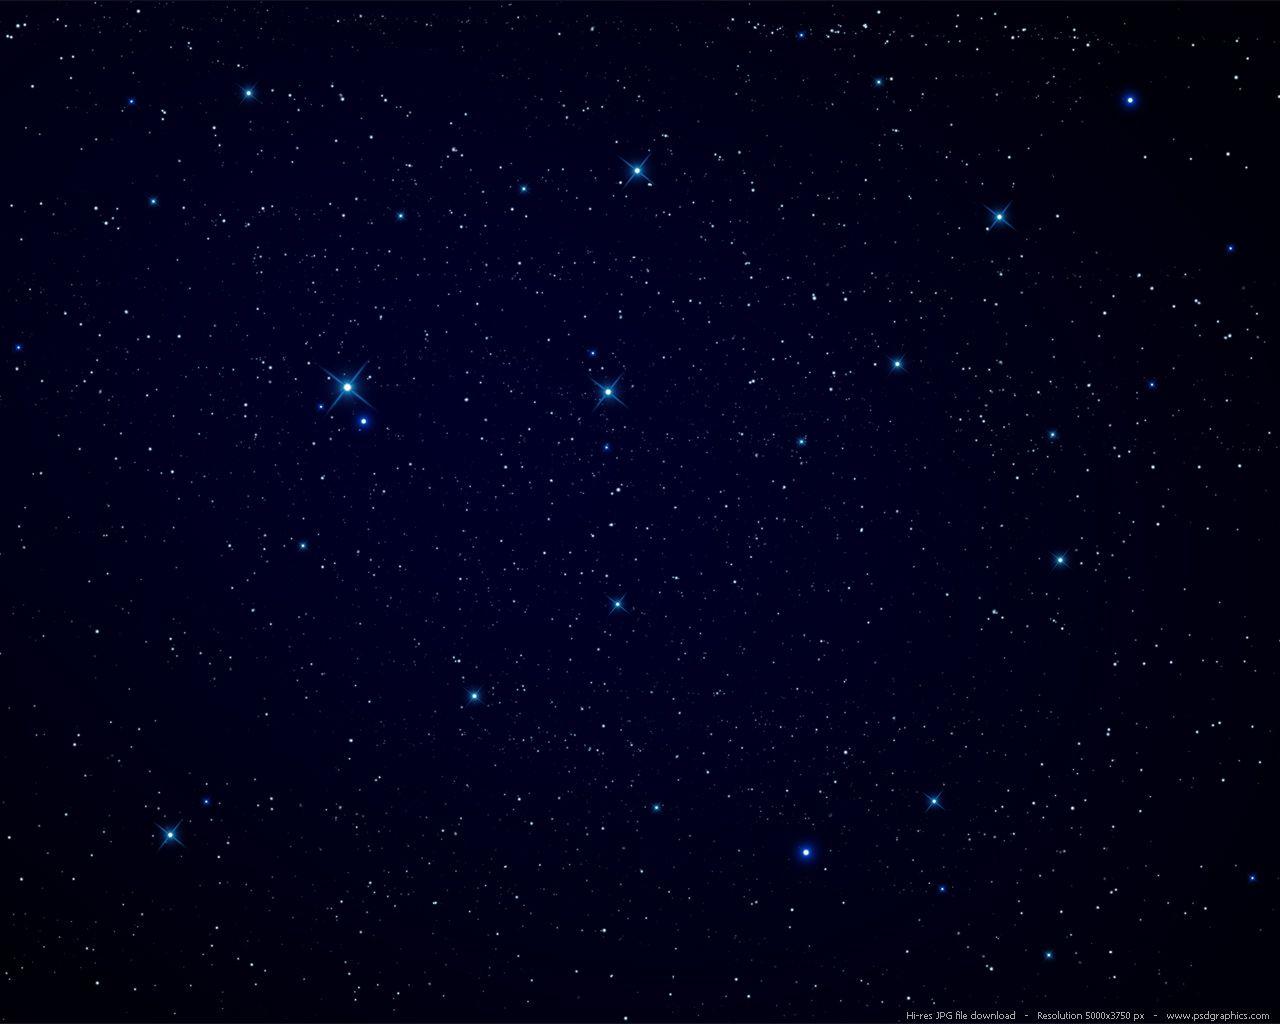 Night Sky Stars Background Night Skies Night Sky Wallpaper Star Background Calm house under night sky shooting star